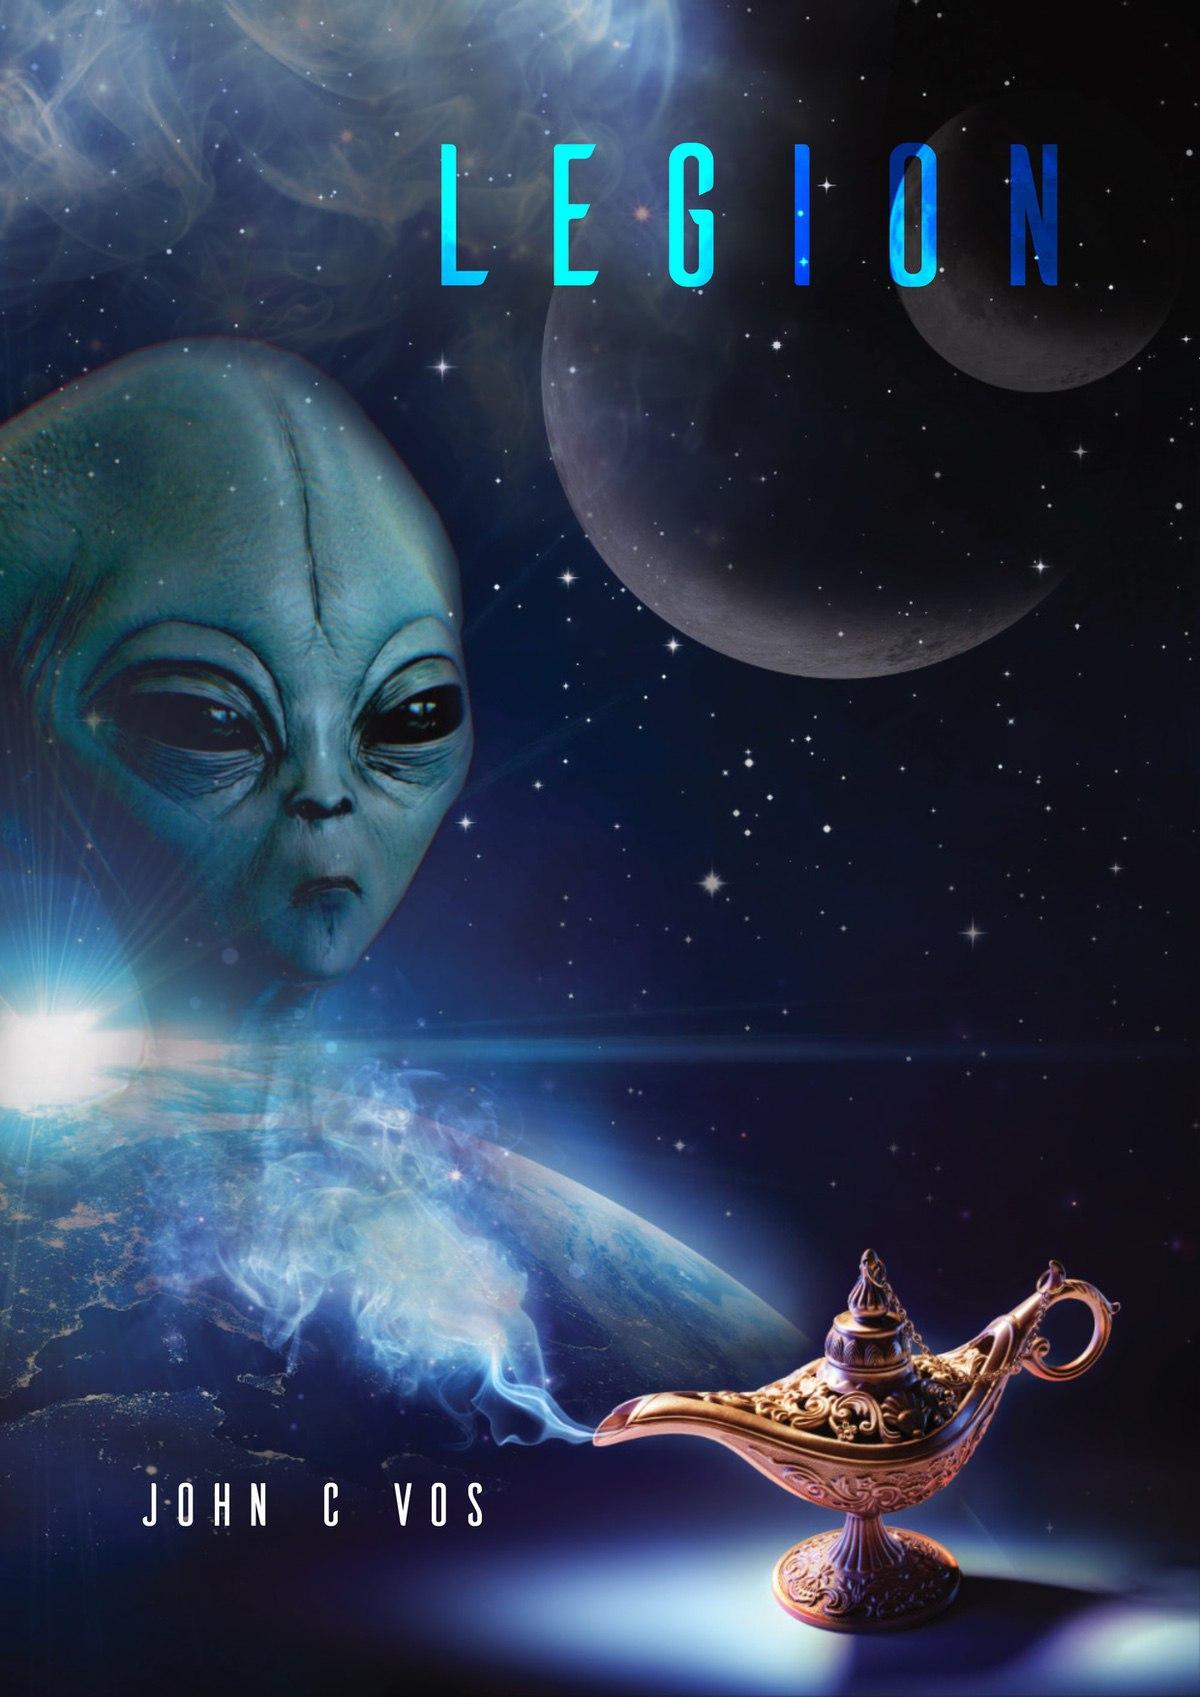 Legion Book Cover Design